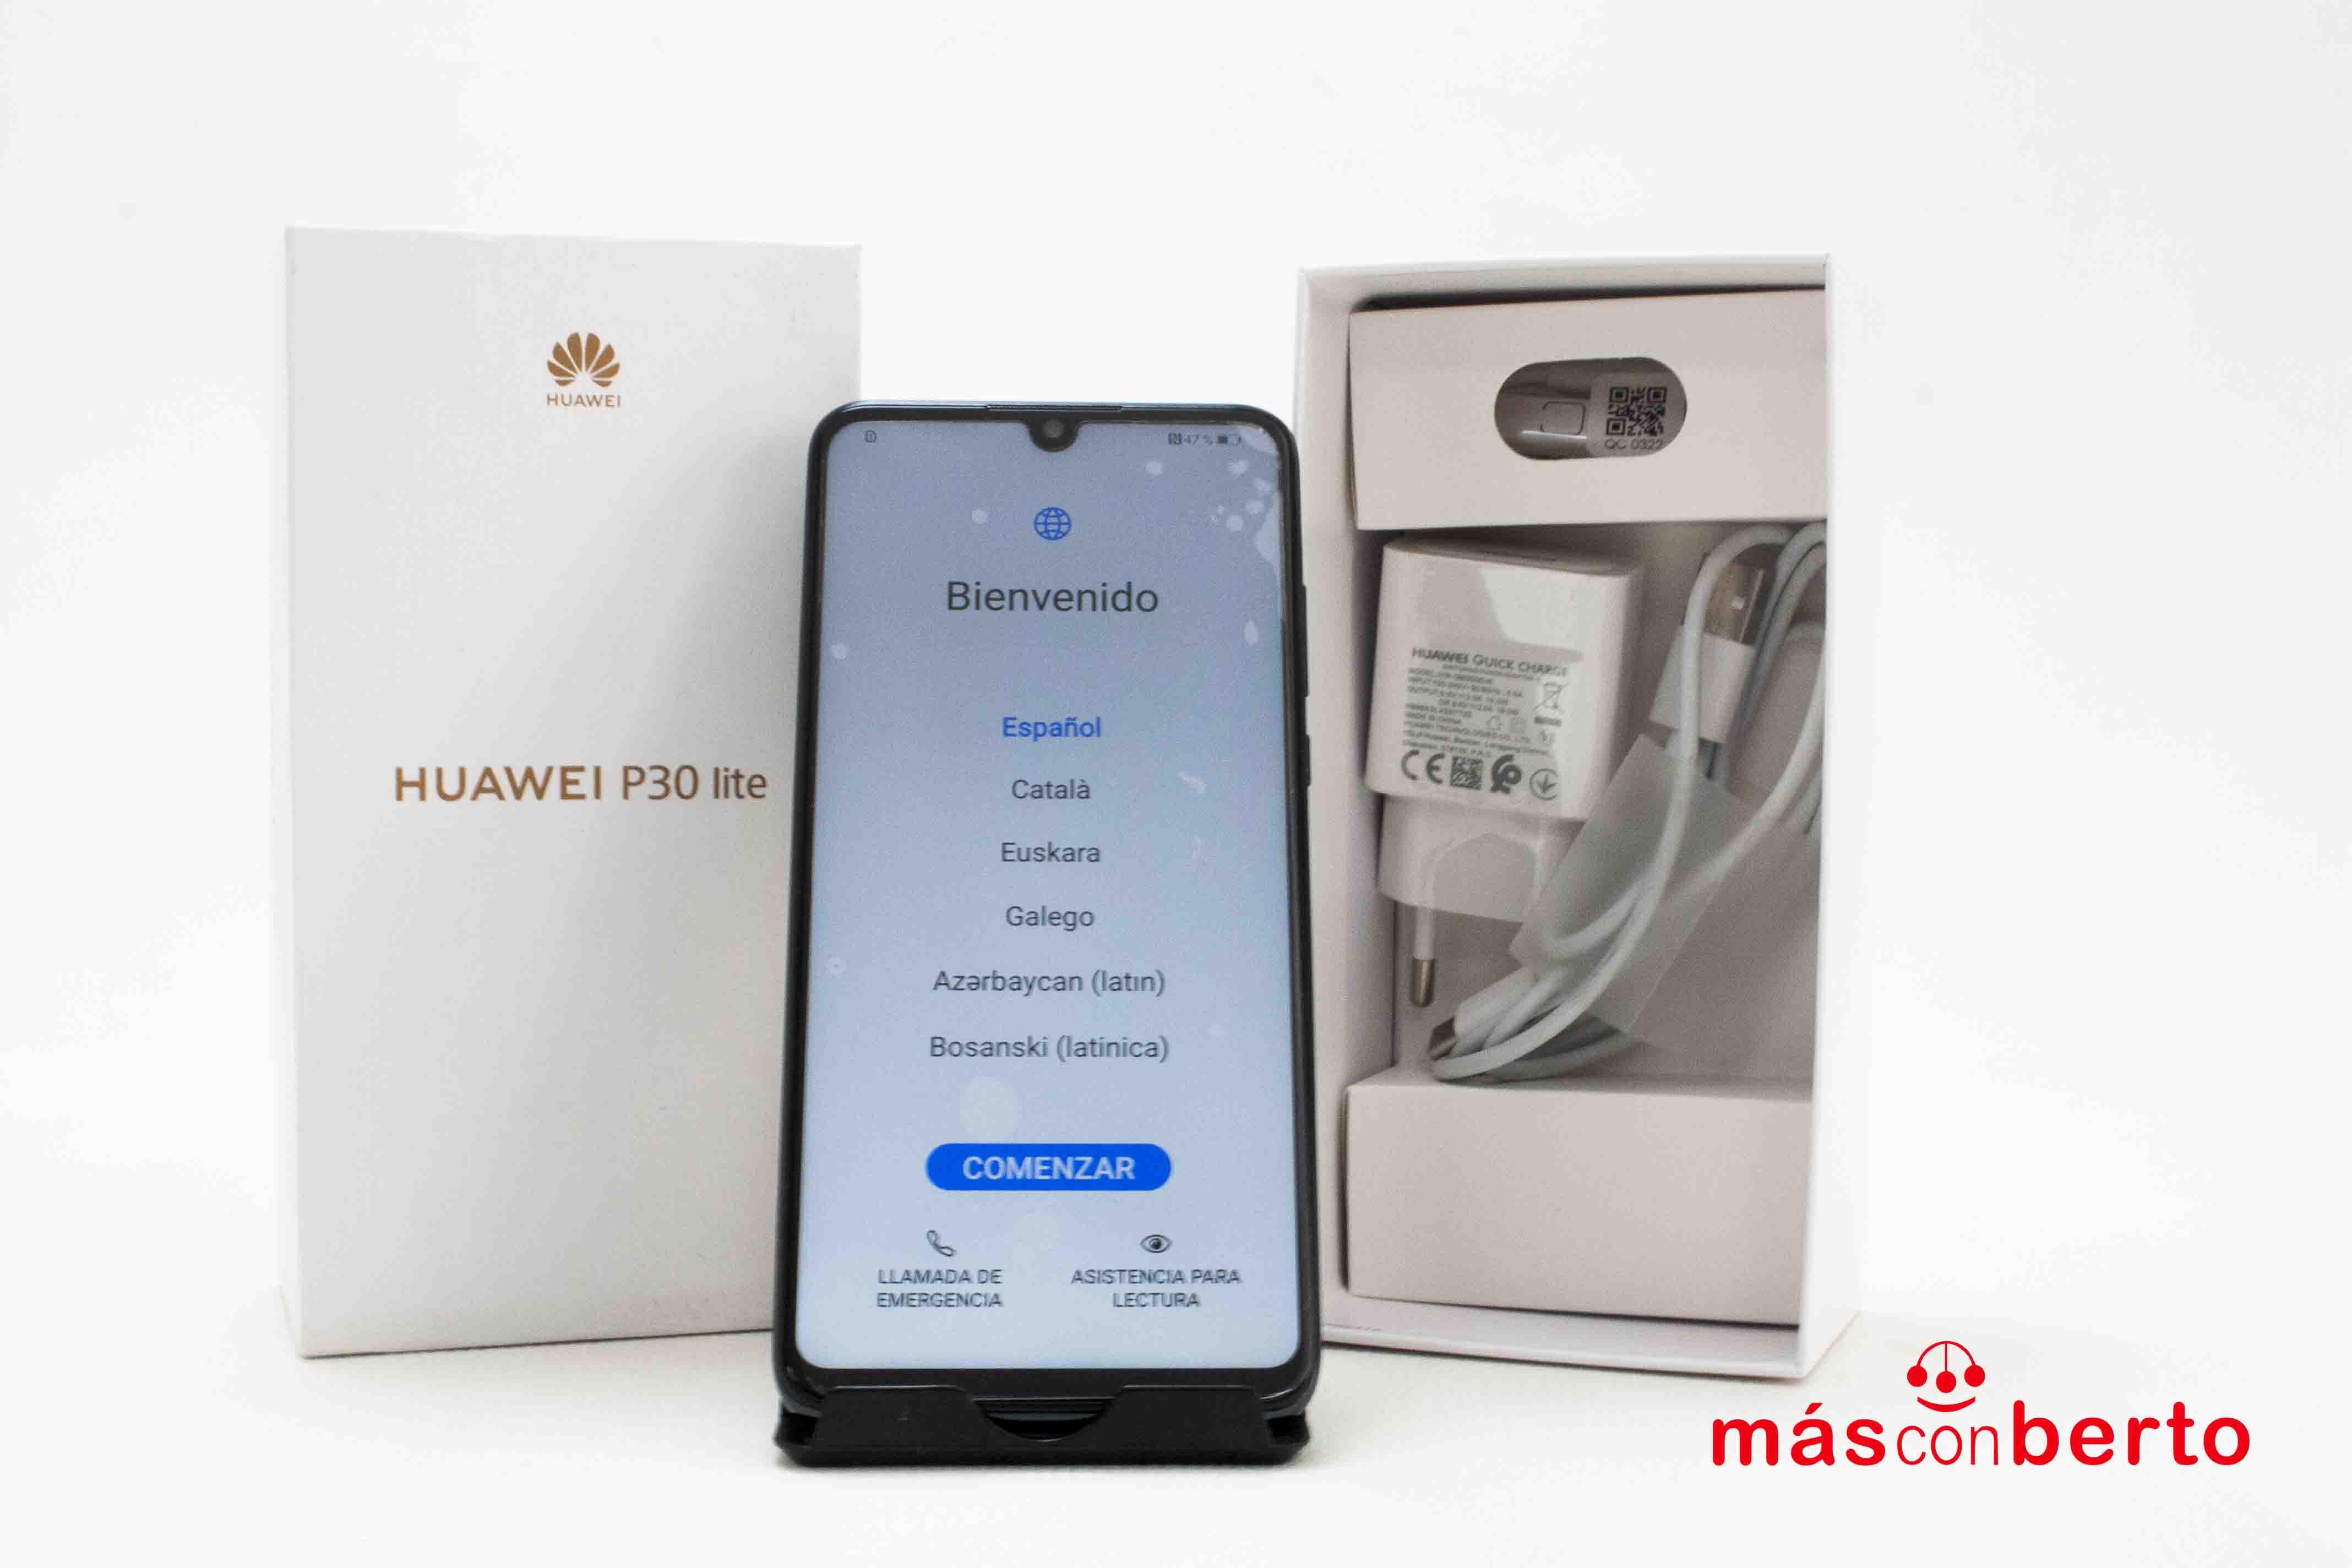 Móvil Huawei P30 lite 128Gb...